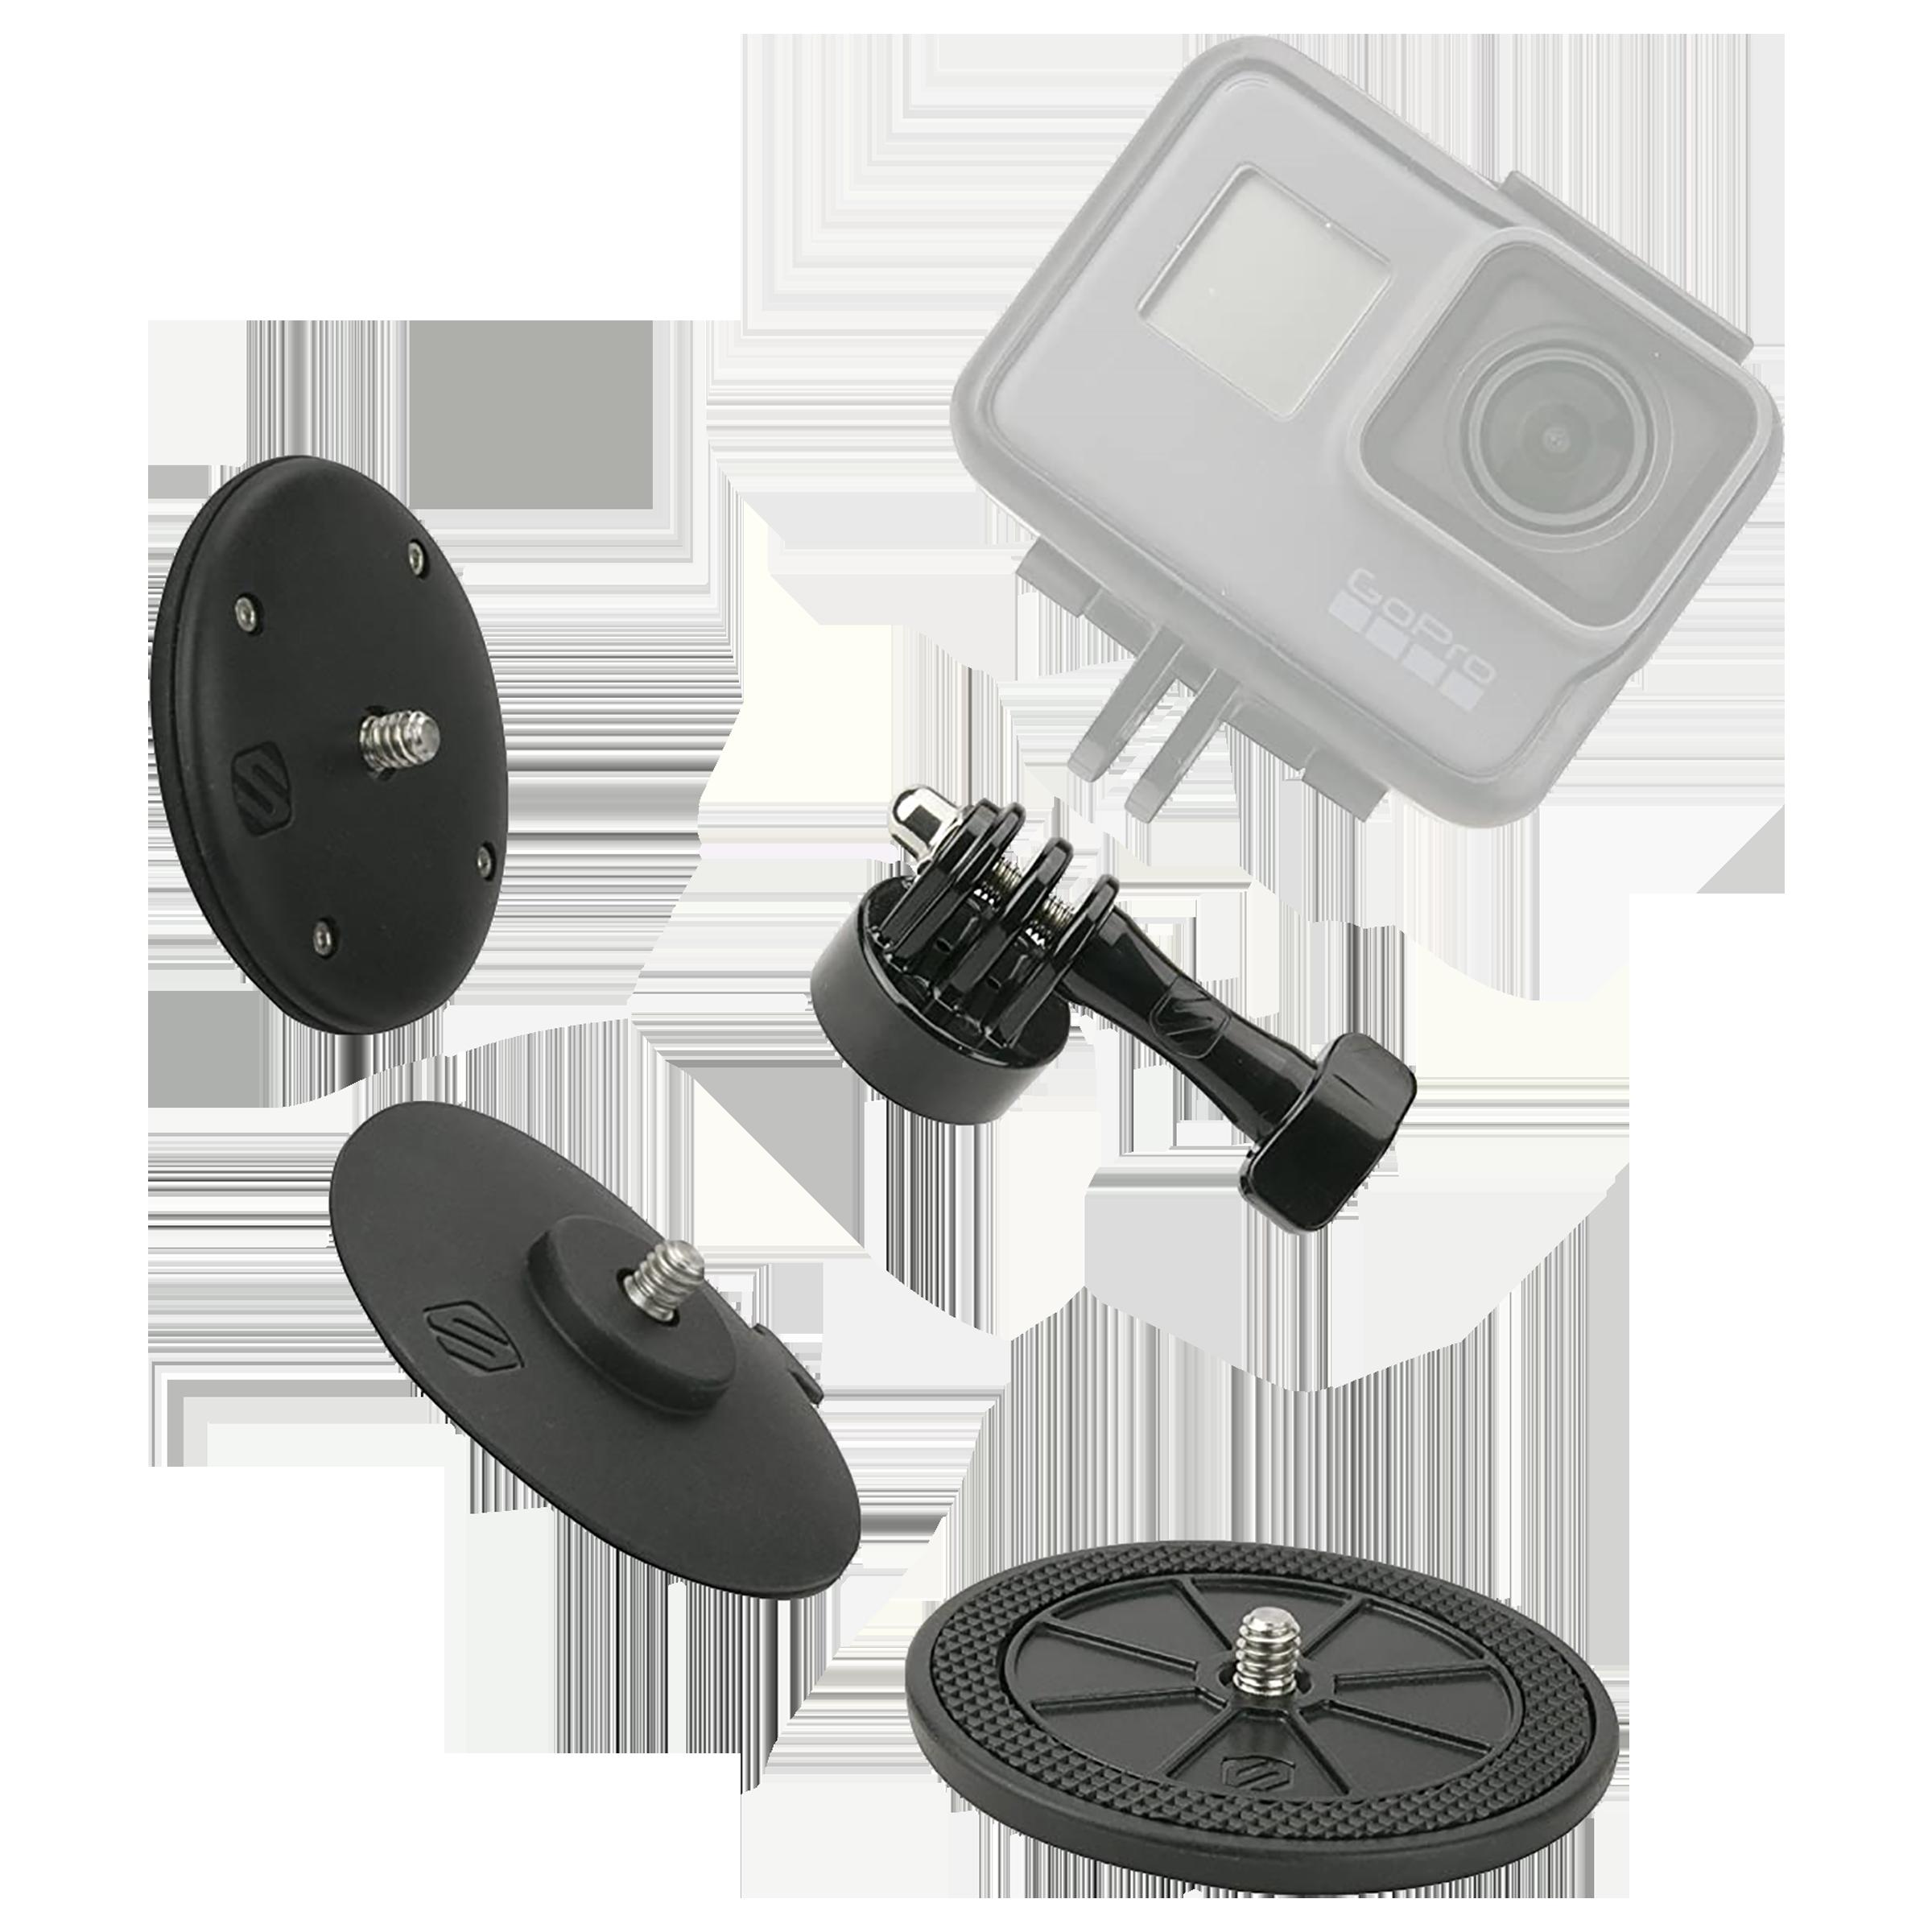 Mounts - Scosche AMK1 Mounting Kit For DSLR Camera (Water Resistant, 0266AMK1, Black)_1